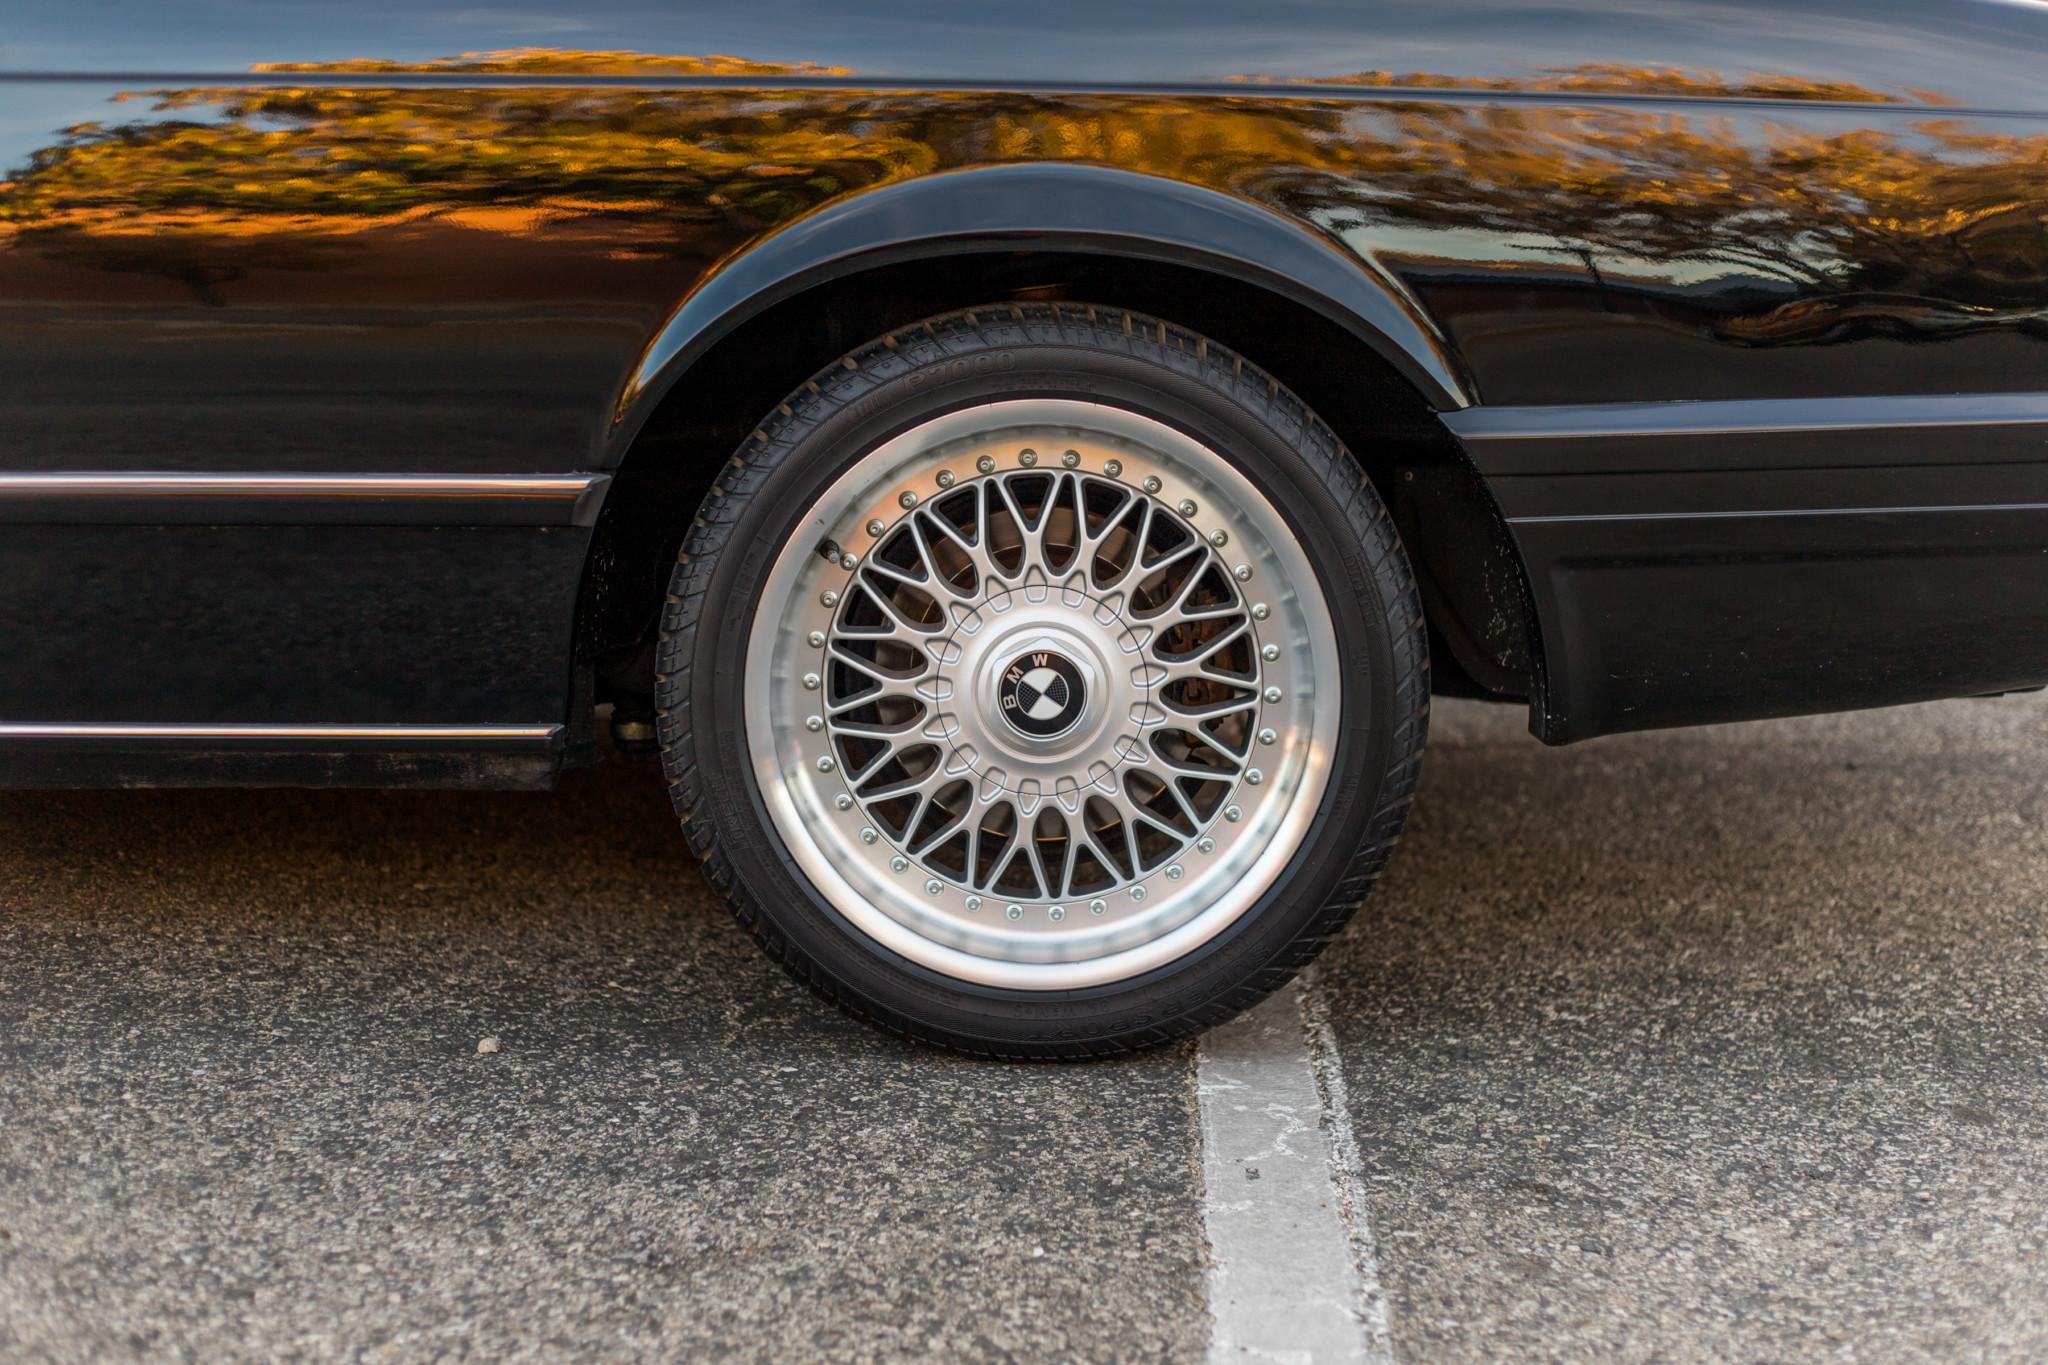 1988 bmw M6 kent classic cars (41).jpg